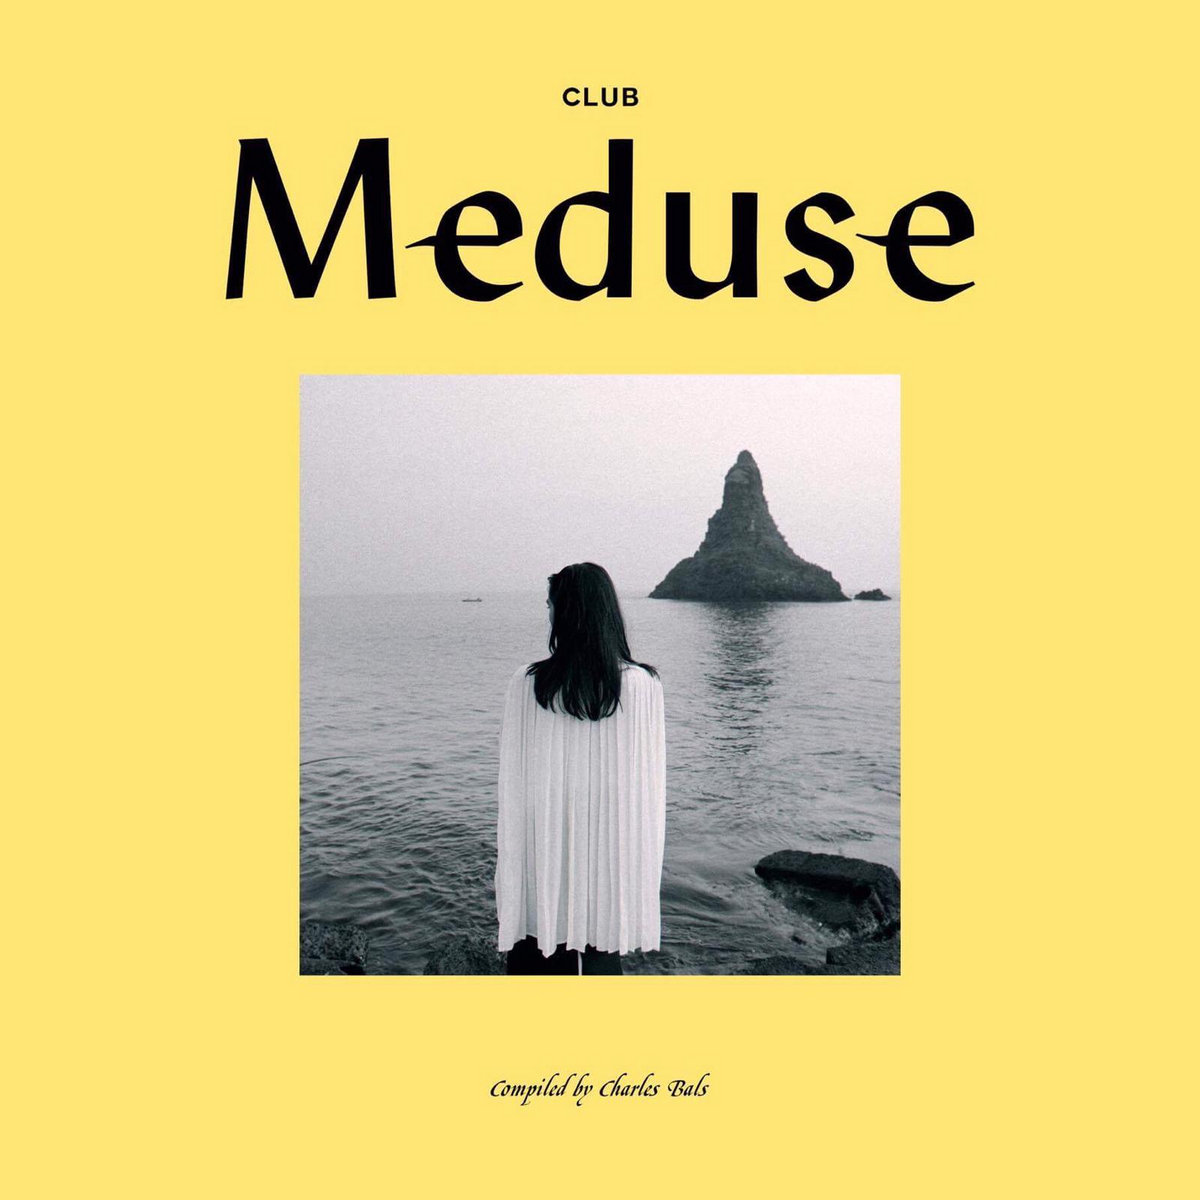 Club Meduse compiled by Charles Bals | Spacetalk